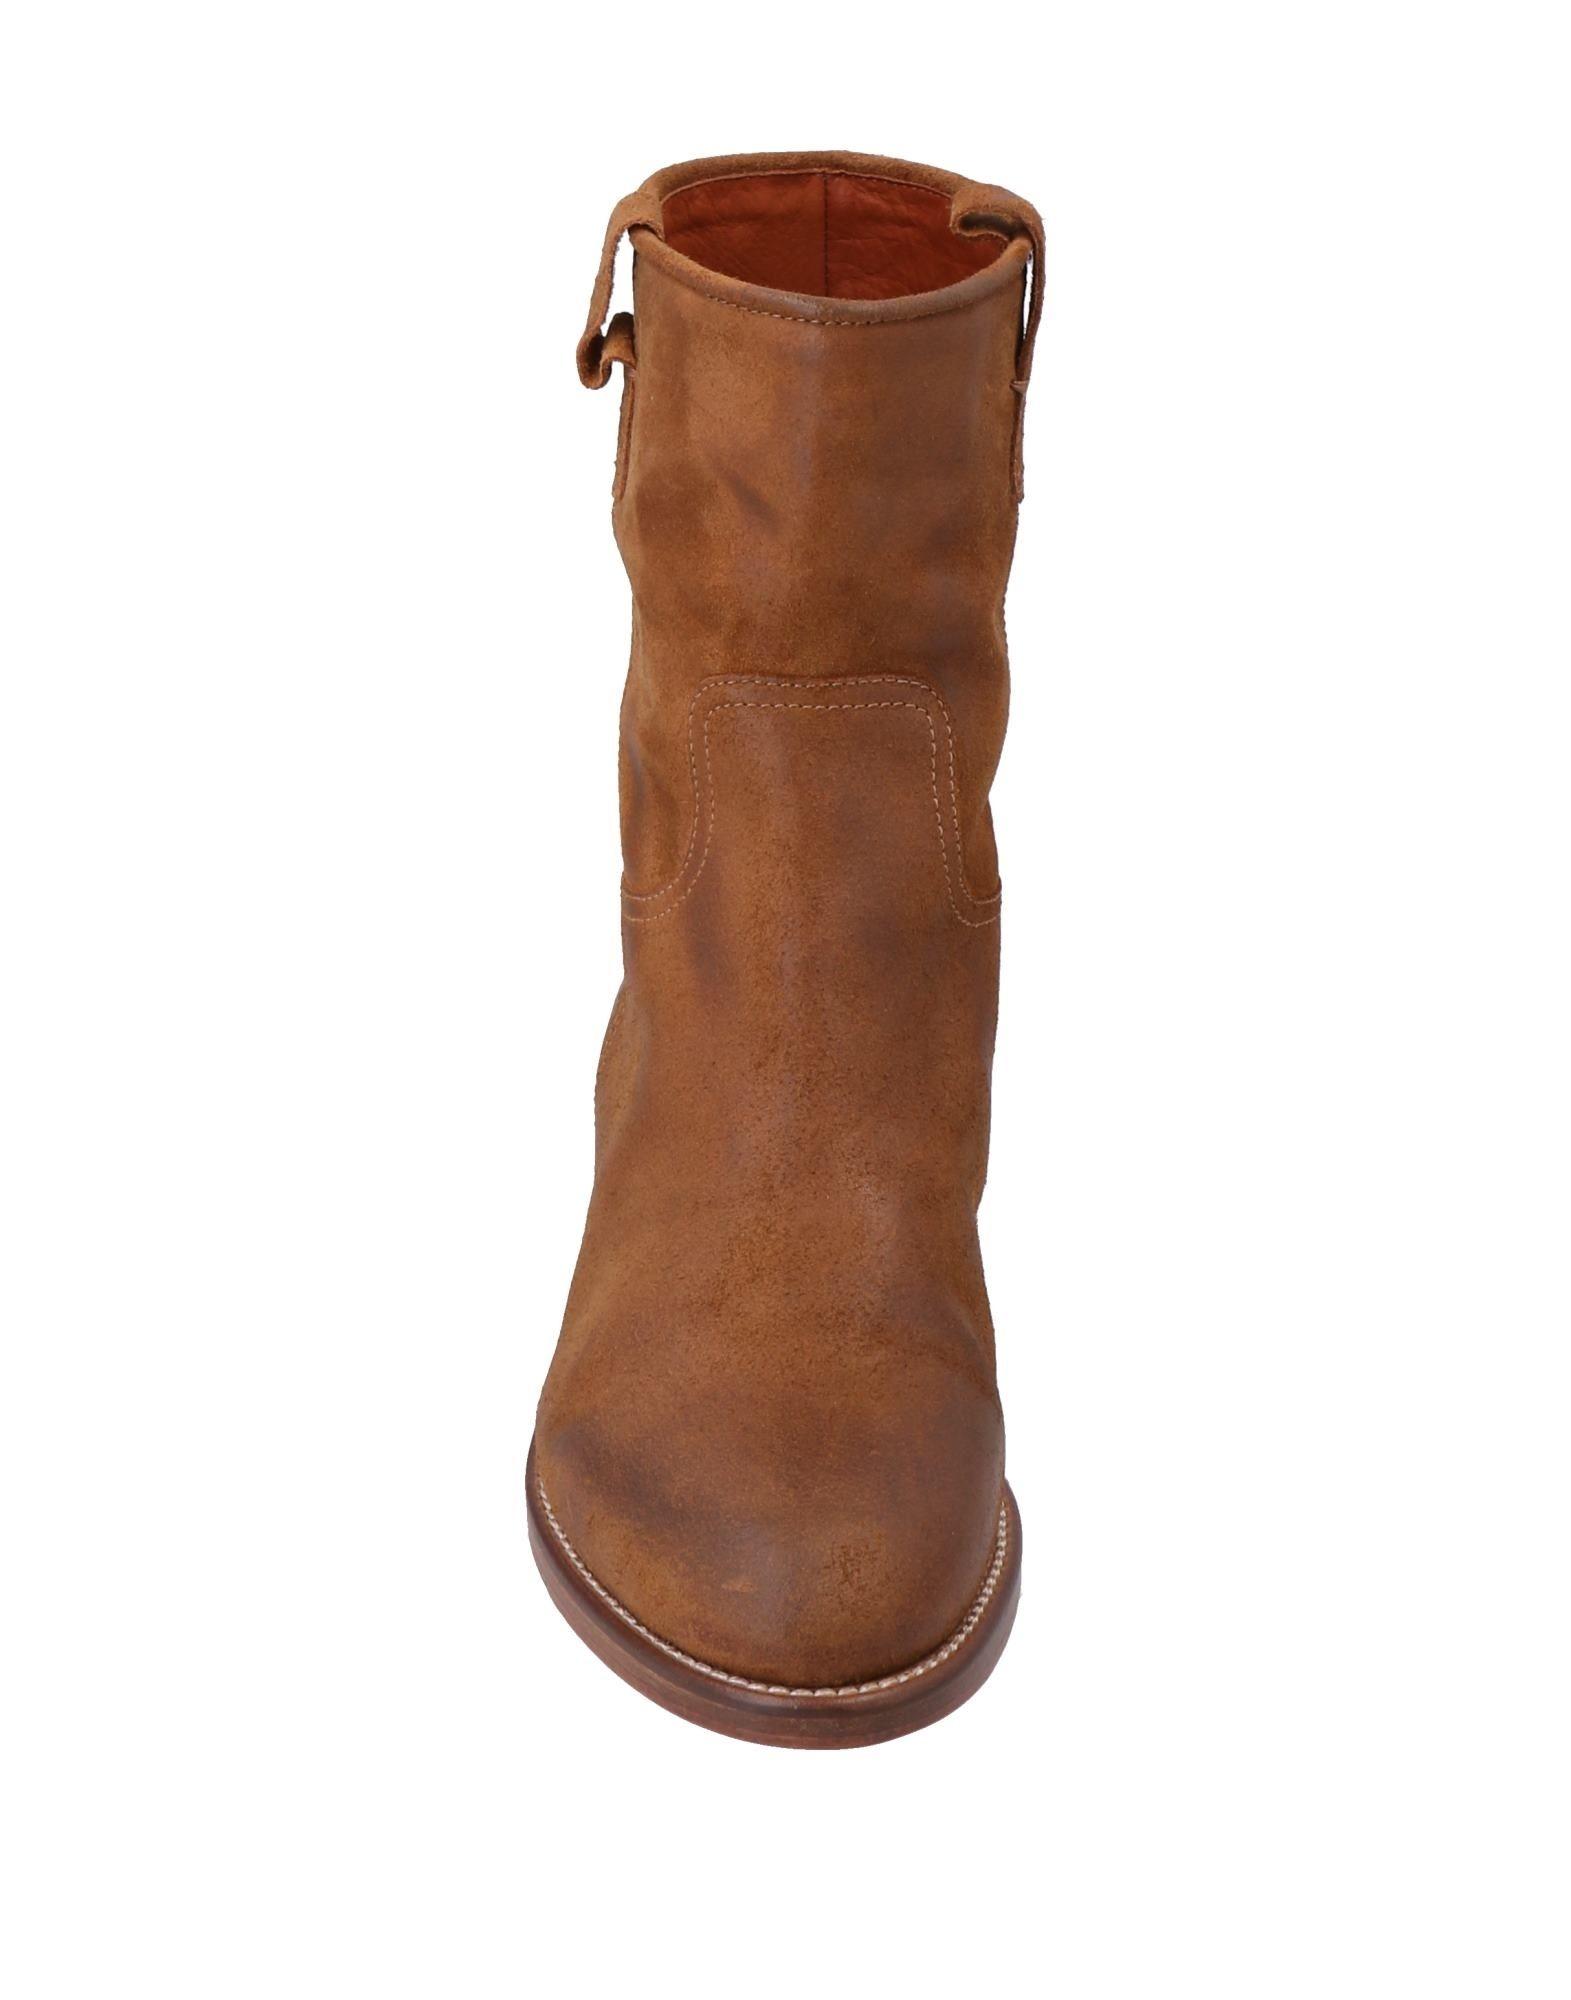 Stilvolle Campero billige Schuhe El Campero Stilvolle Stiefelette Damen  11544474AP f356a5